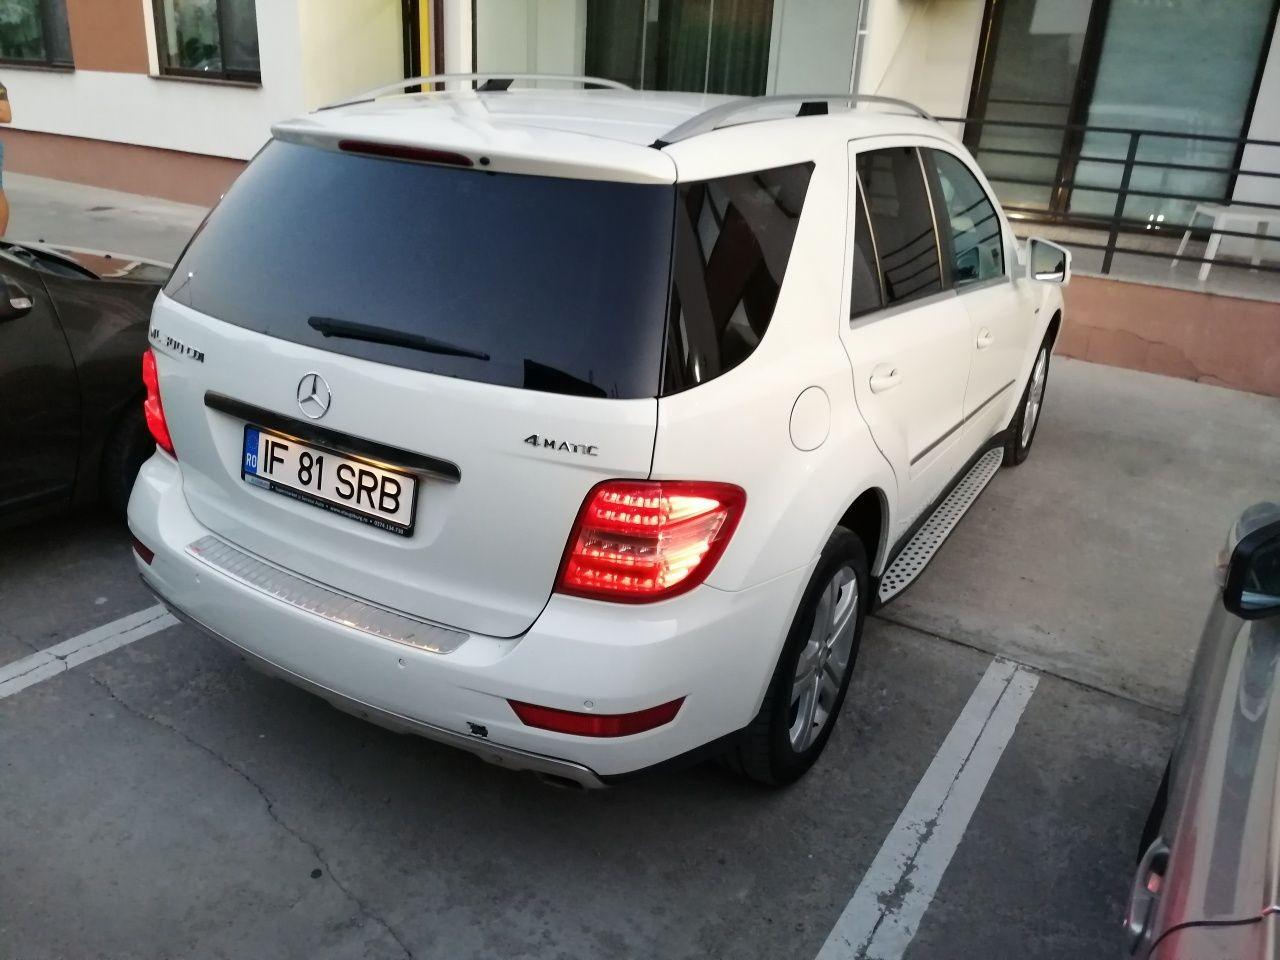 Mercedes ML 300 300 CDI 4 MATIC 2010